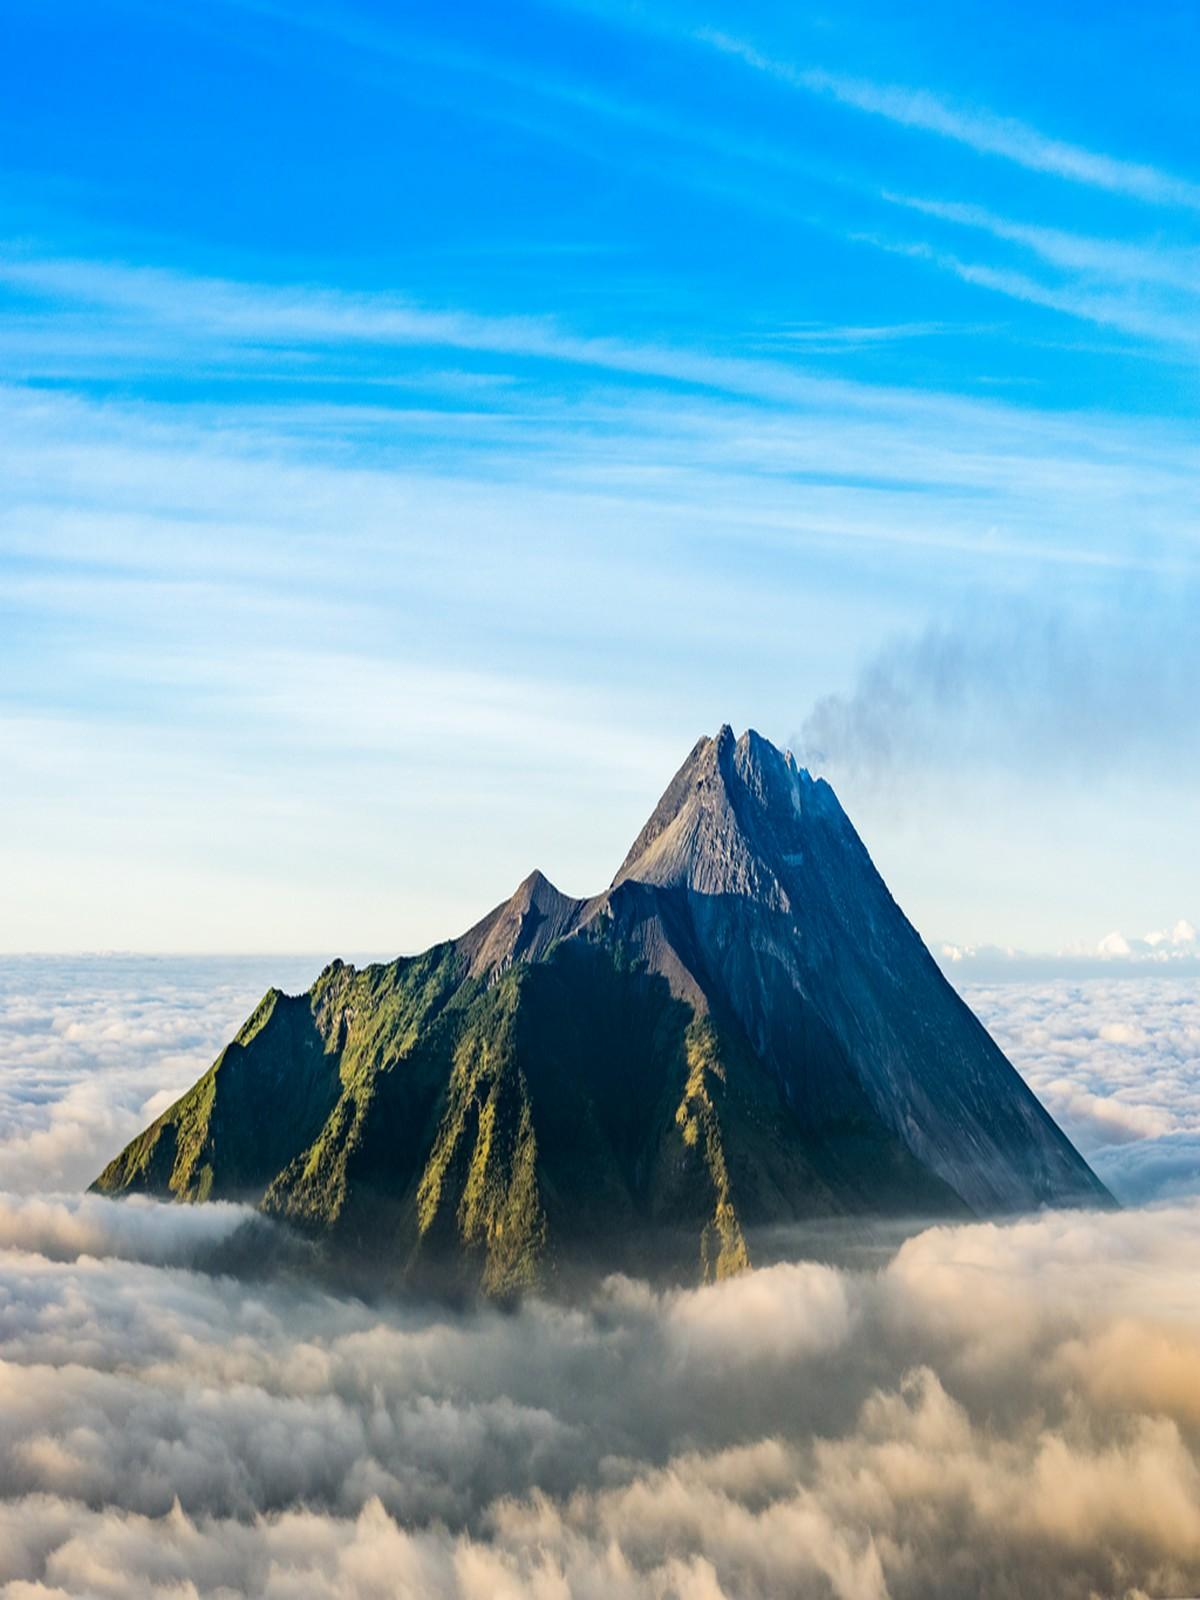 frenky harry  9ExPfUFWHM unsplash - Gunung Merapi: Mayat dalam keadaan sujud